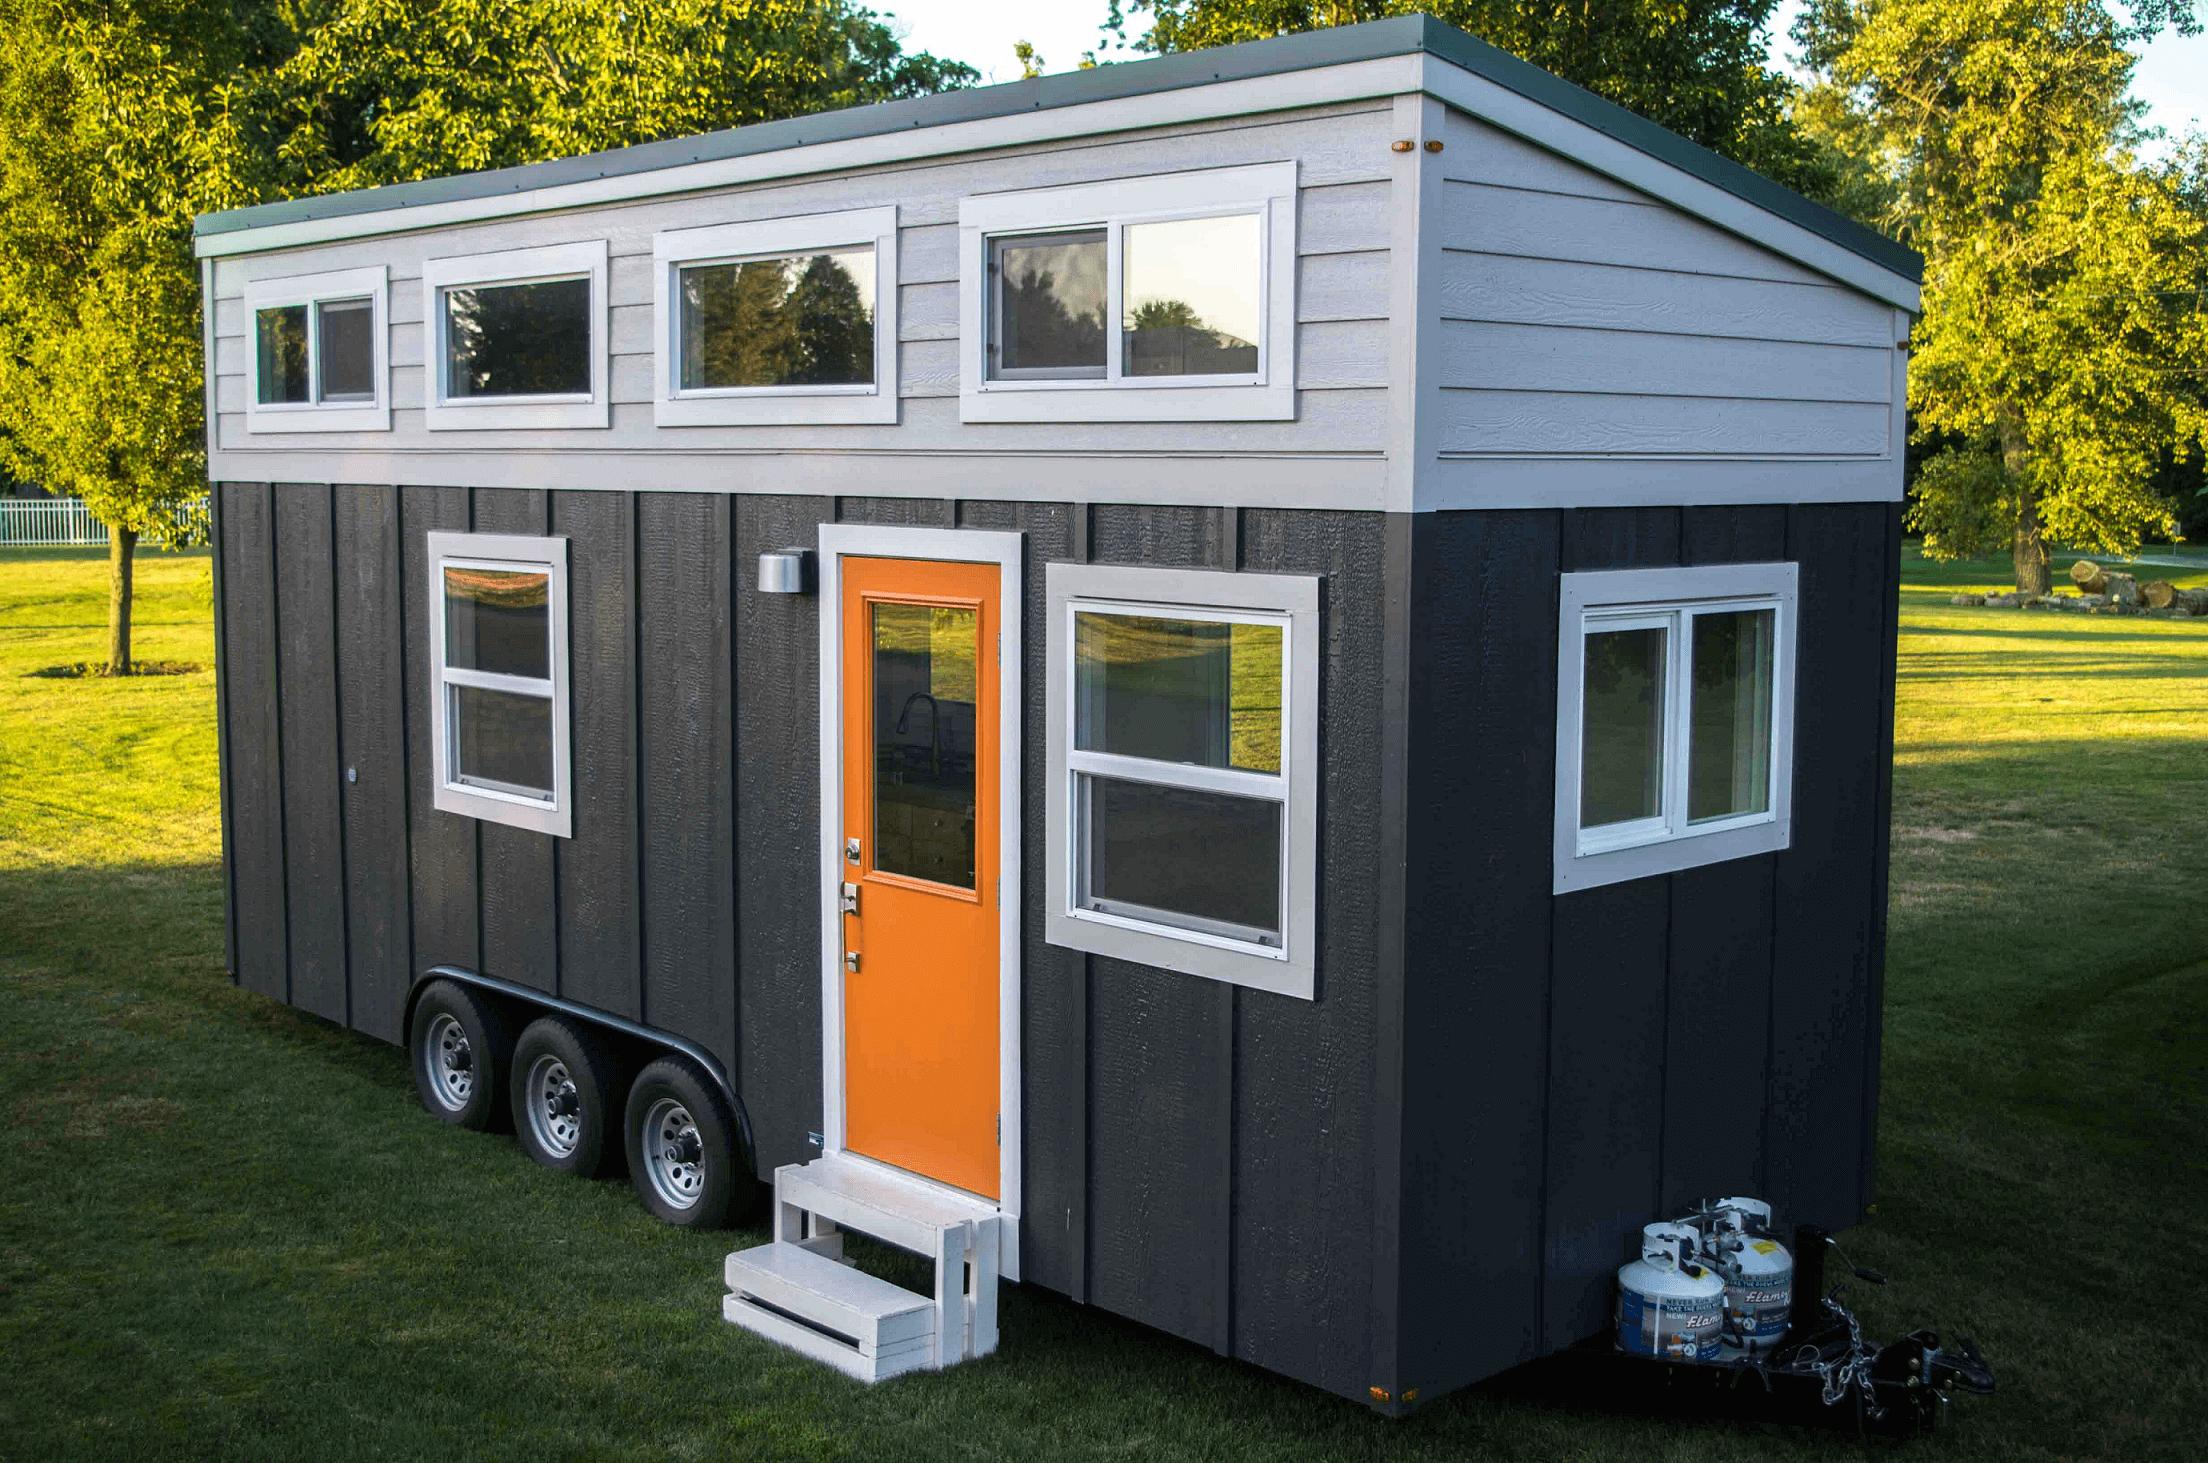 Simple tiny house one level design exterior